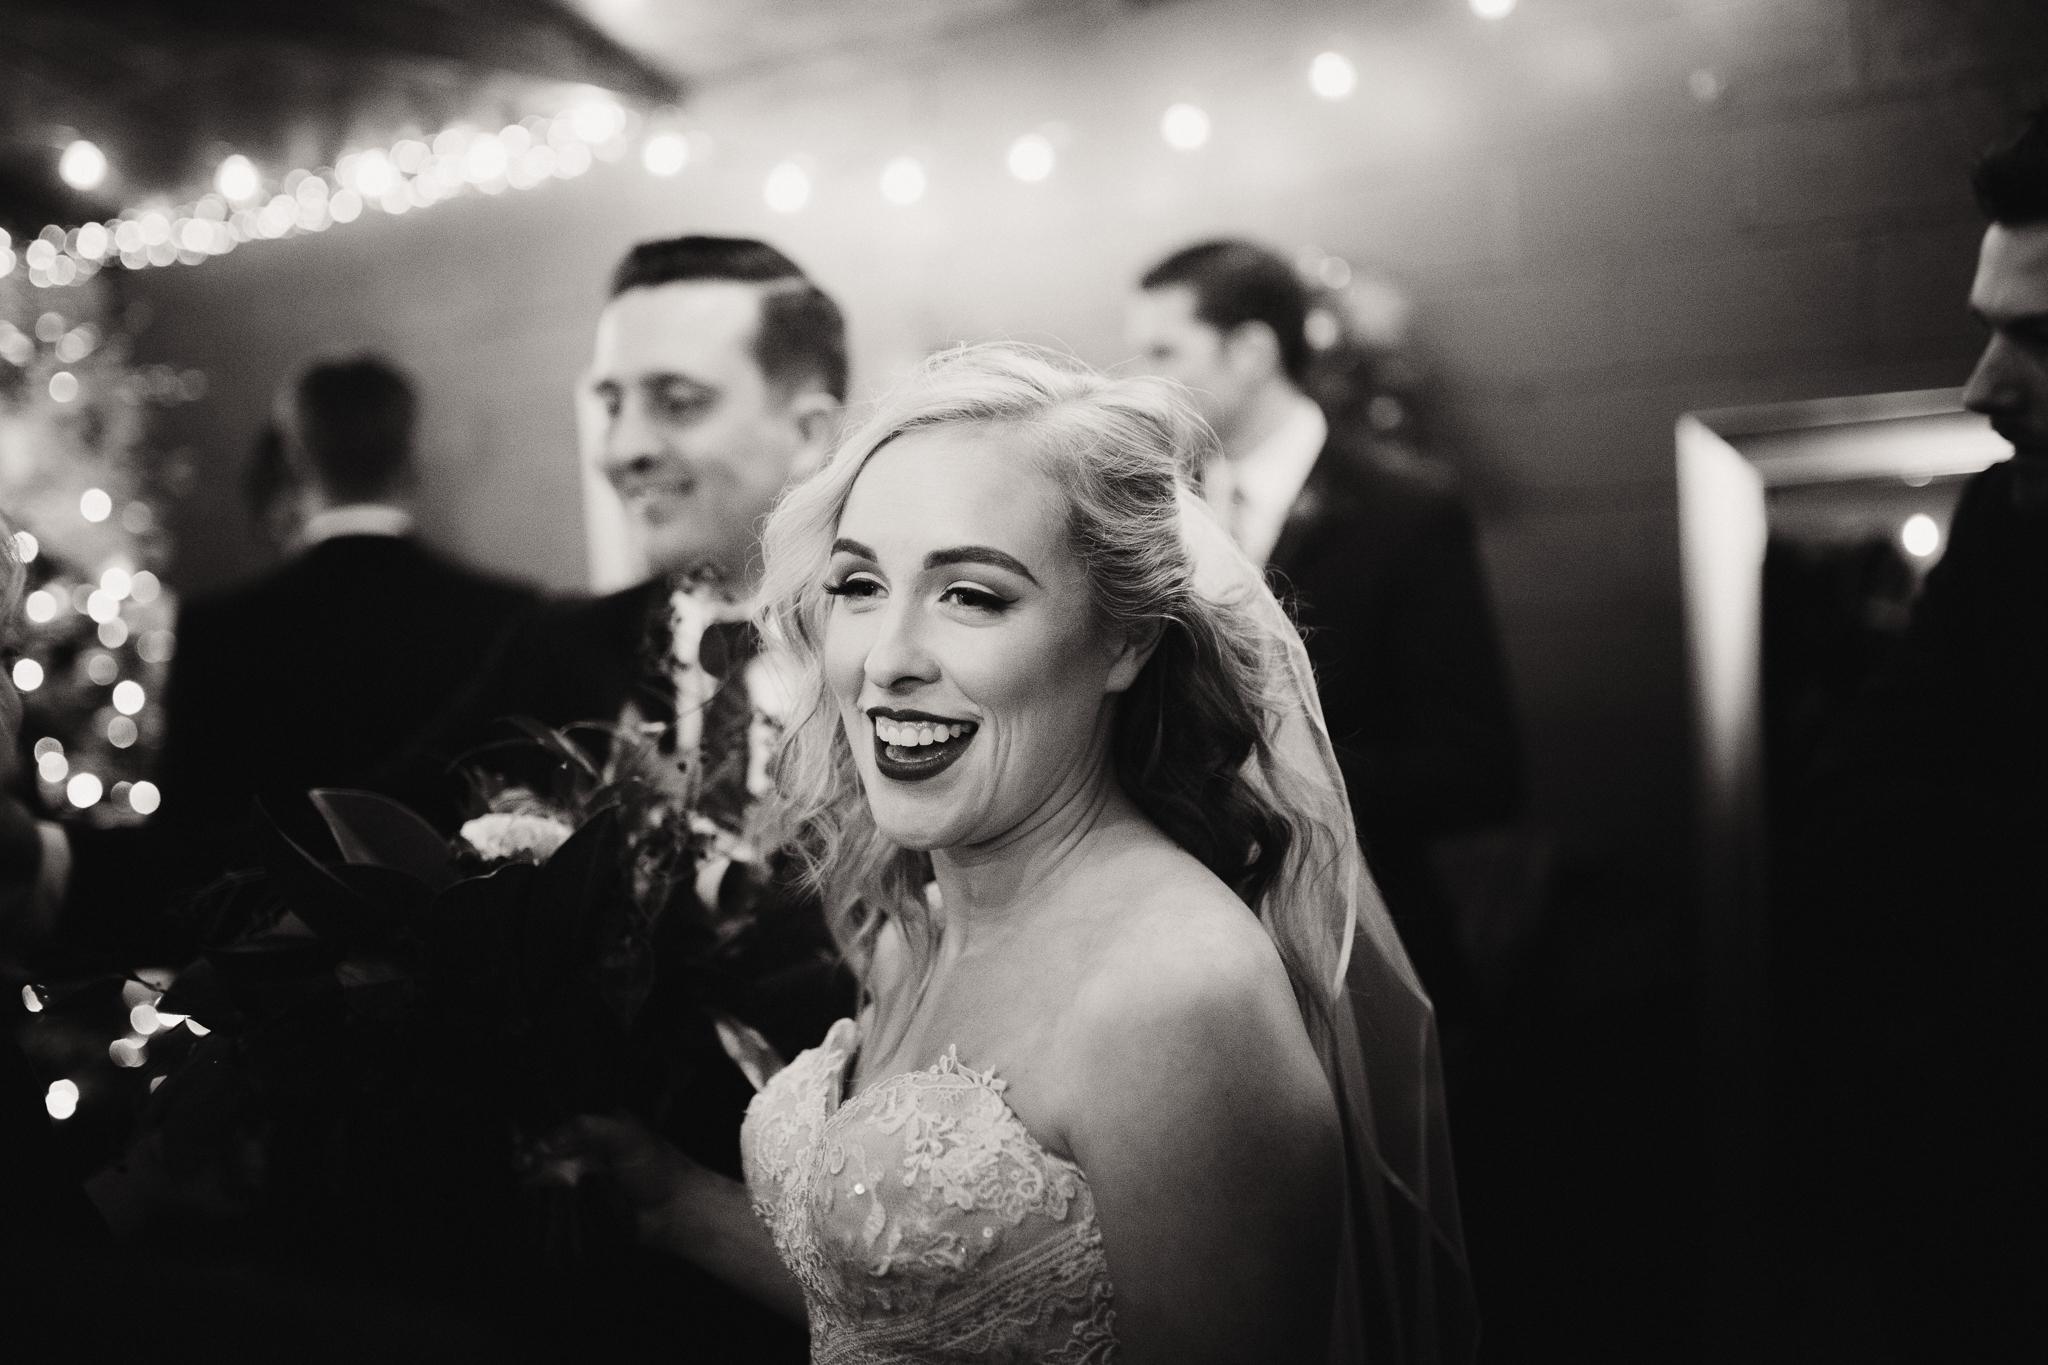 0127 Ariana Jordan Photo - Cameron & Lauren's Wedding at Talon Winery  7138.jpg